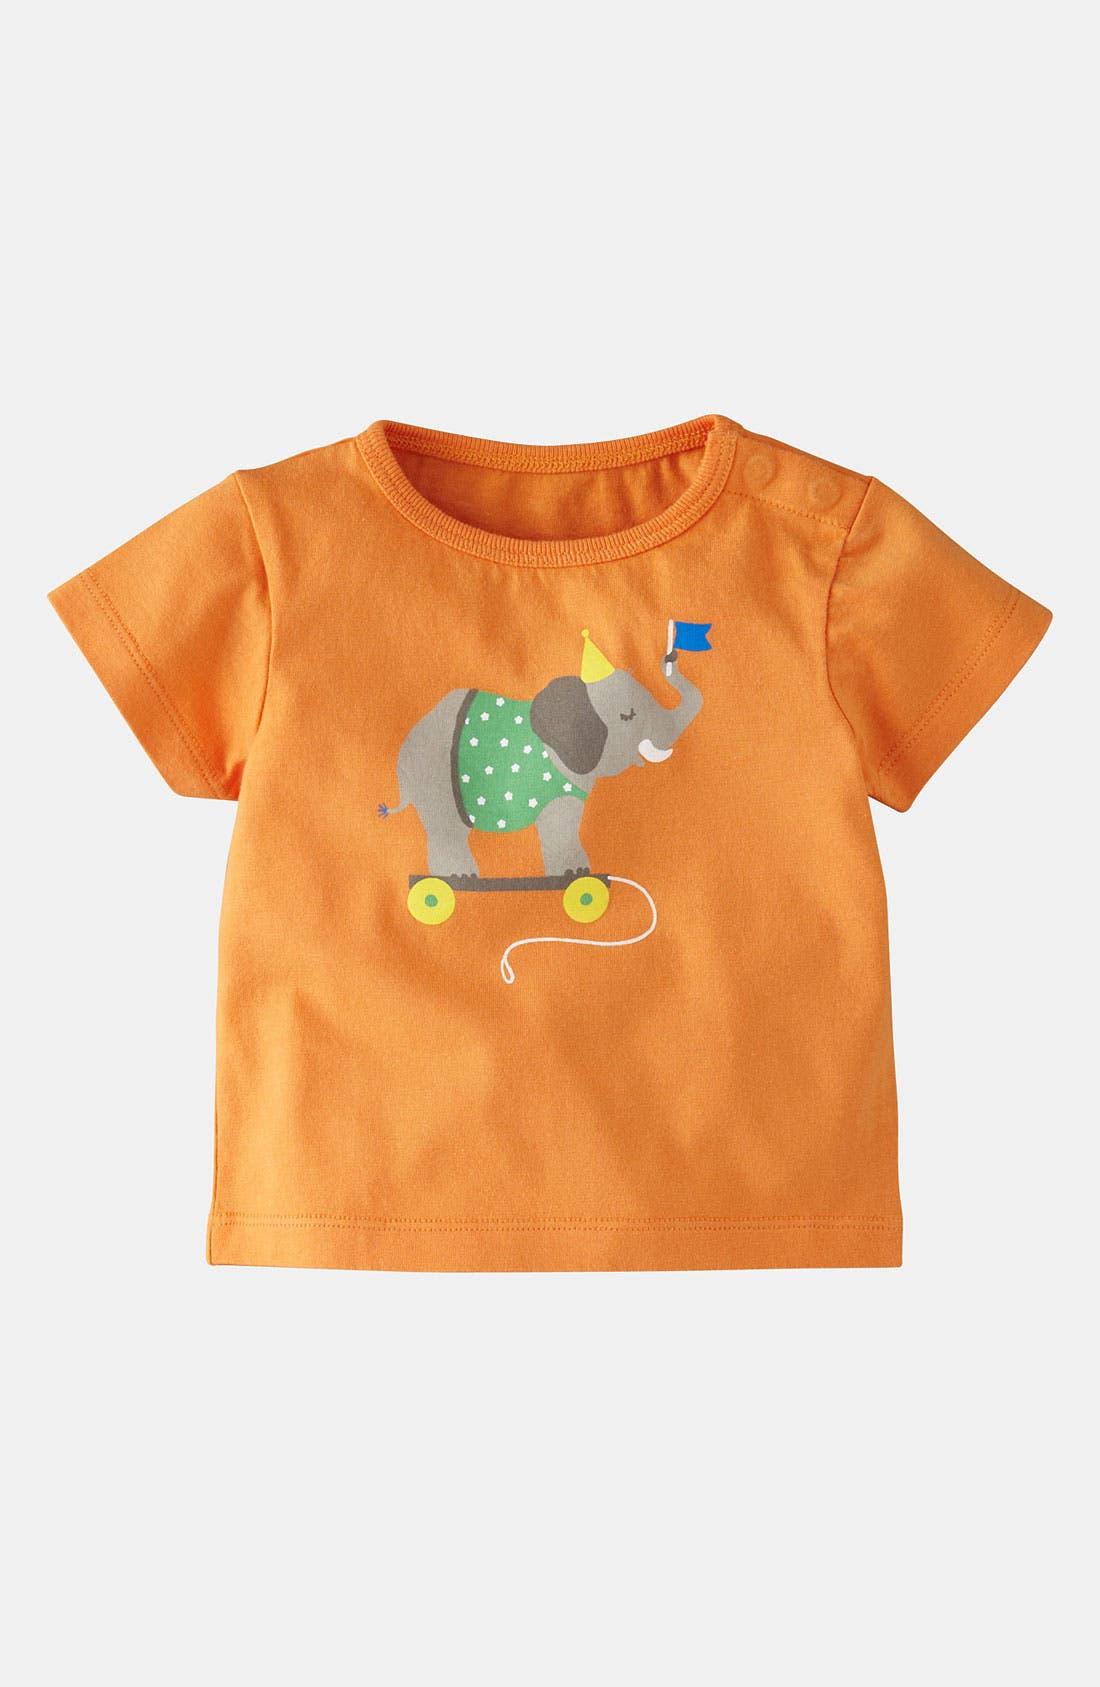 Alternate Image 1 Selected - Mini Boden 'Circus Animal' T-Shirt (Baby)